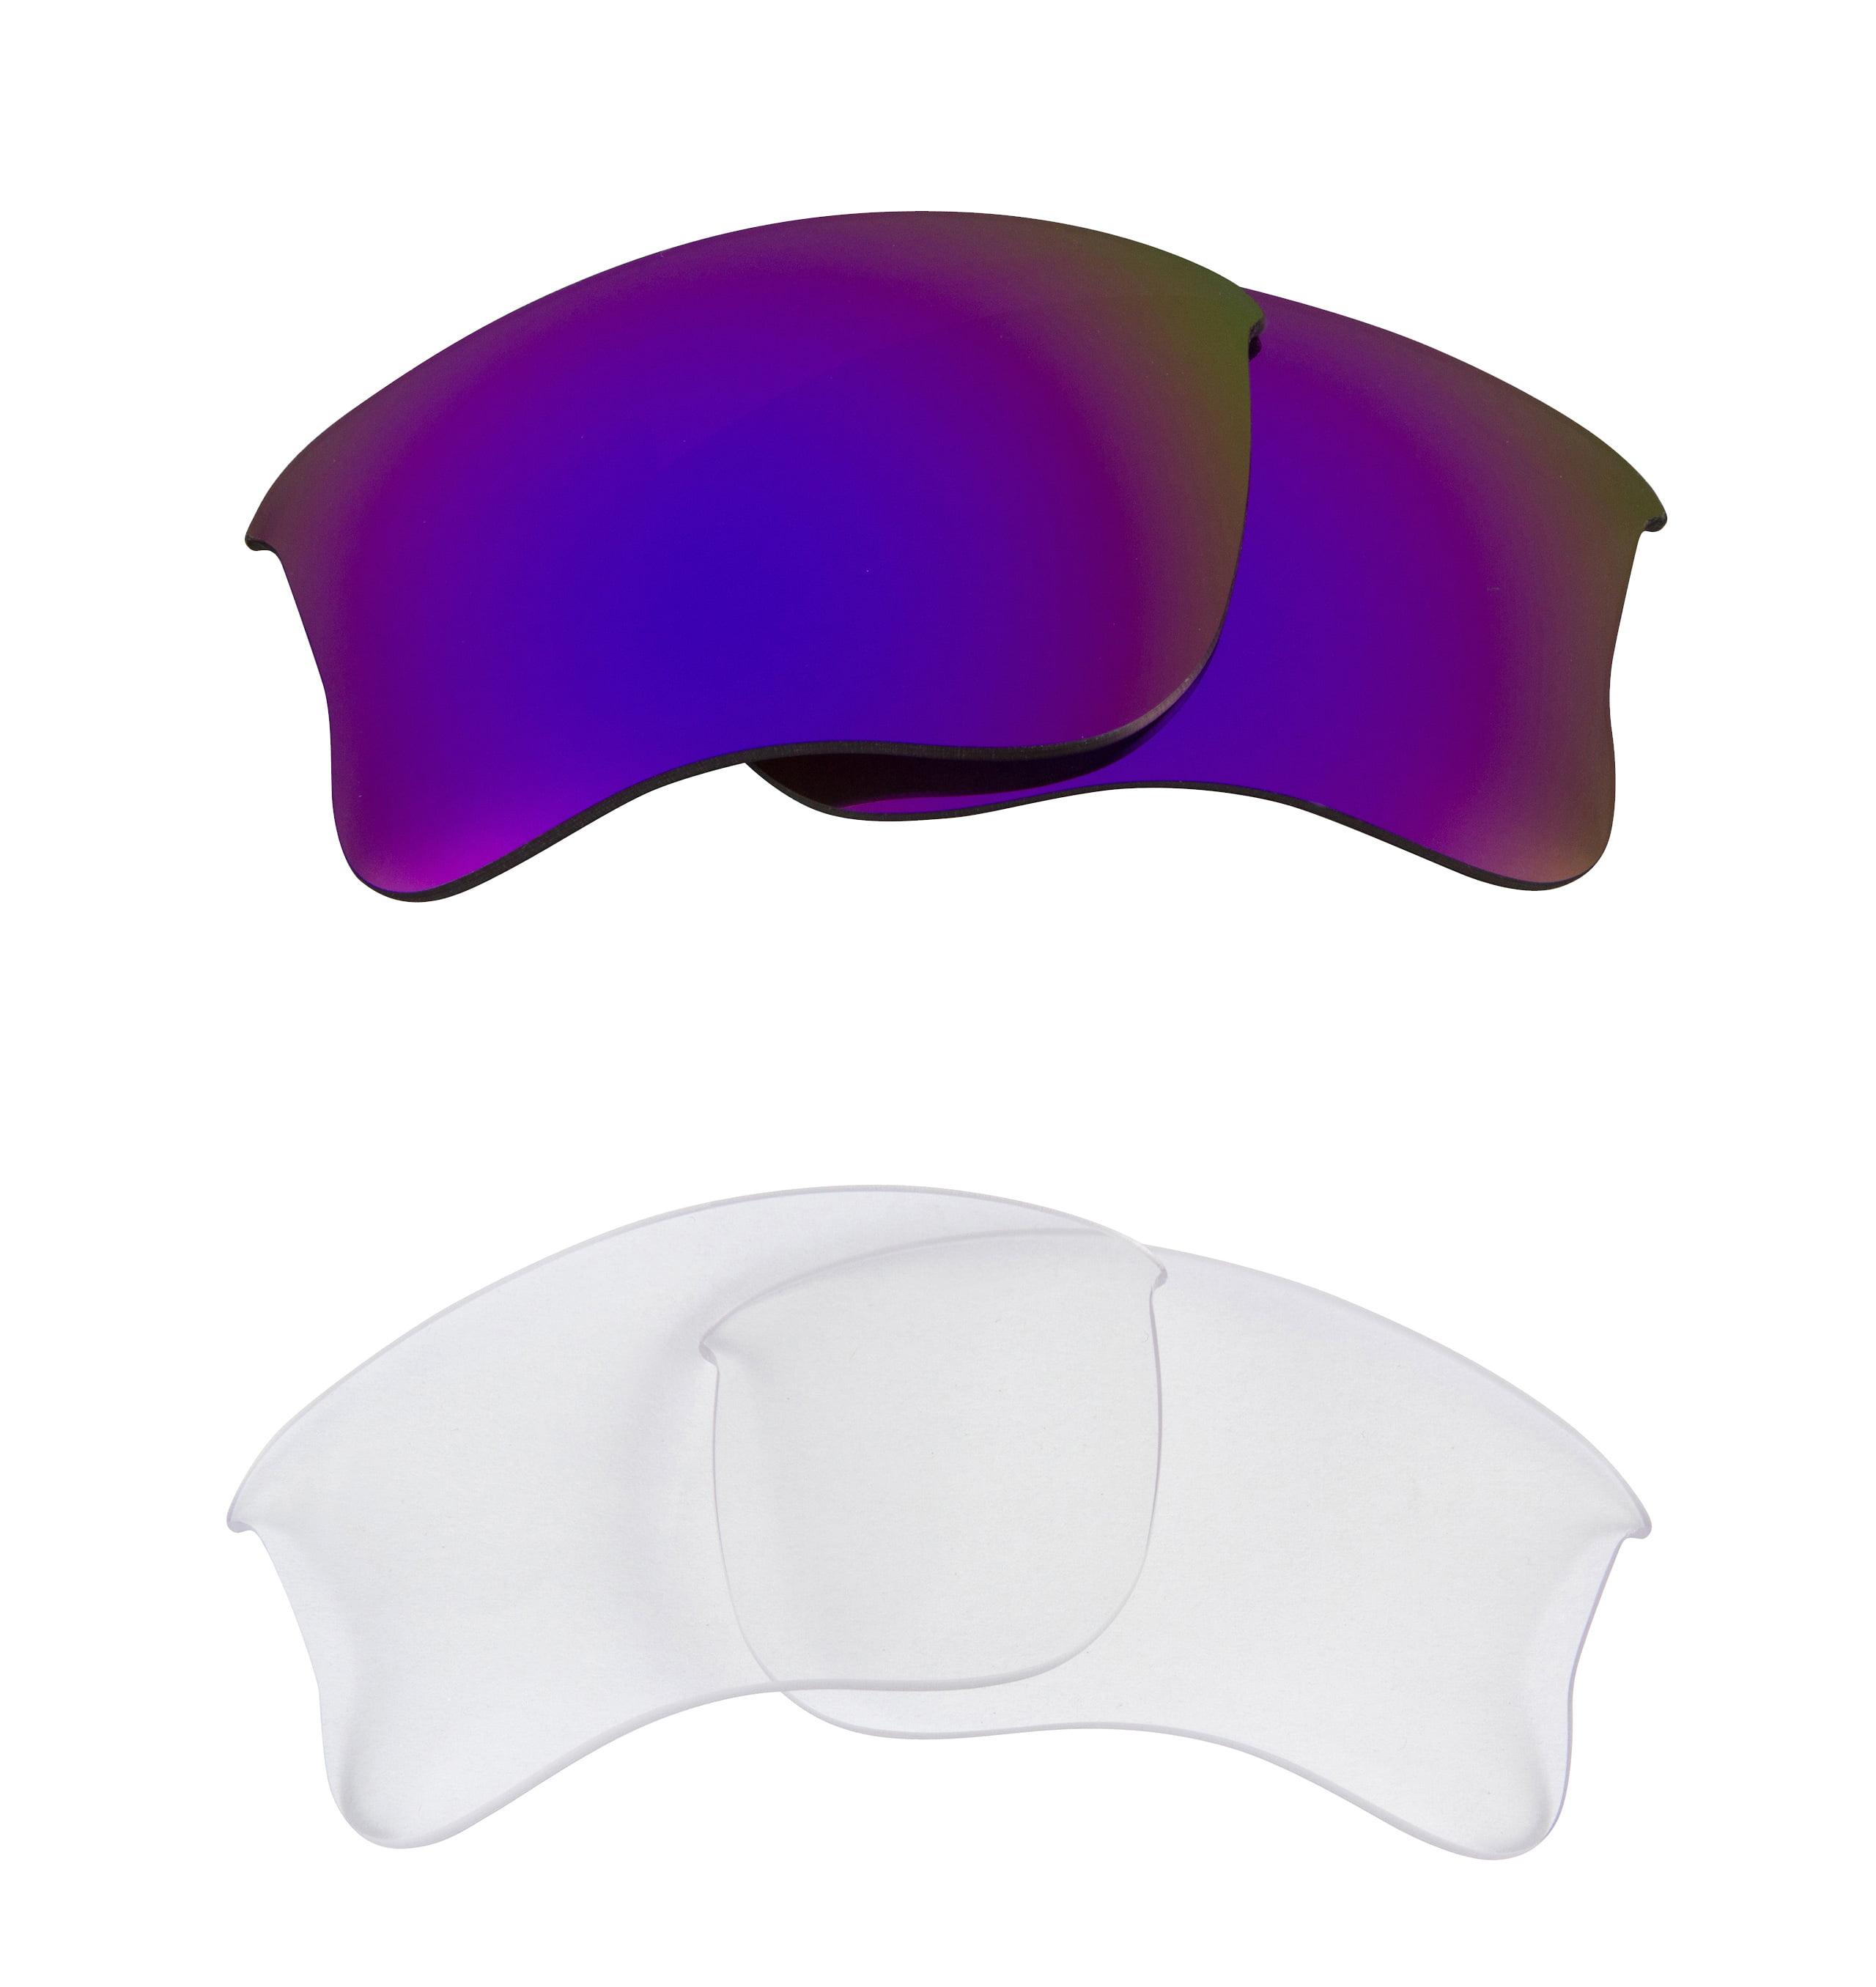 42115e85ad0 Seek Optics - New SEEK Replacement Lenses for Oakley HALF JACKET 2.0 ...